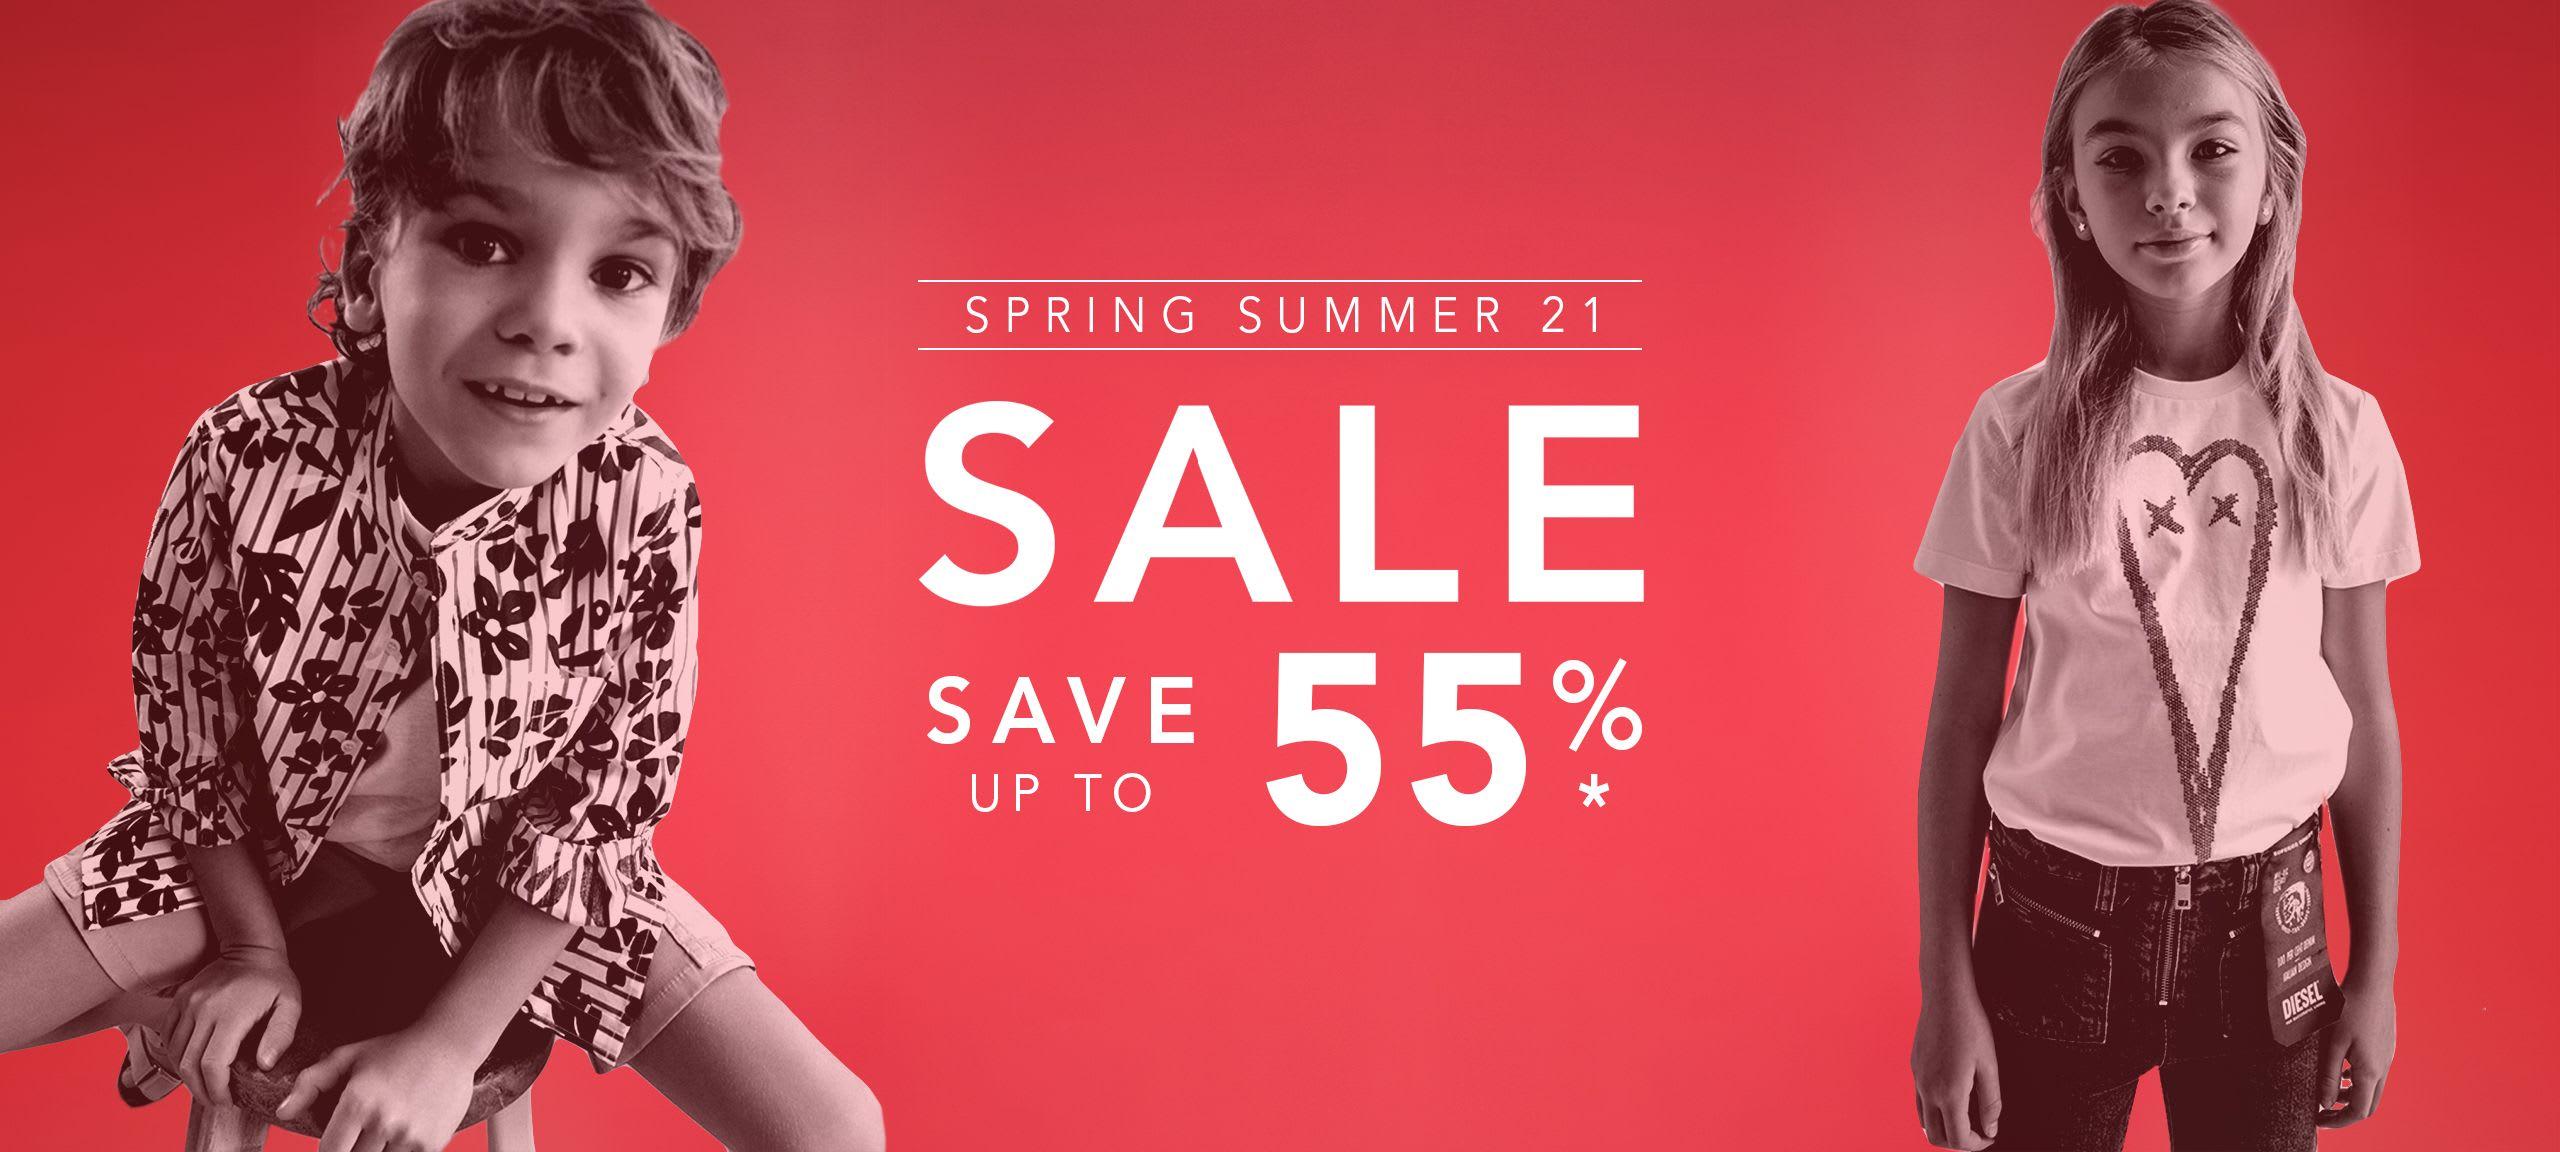 Kids Spring Summer 21 Sale by italist